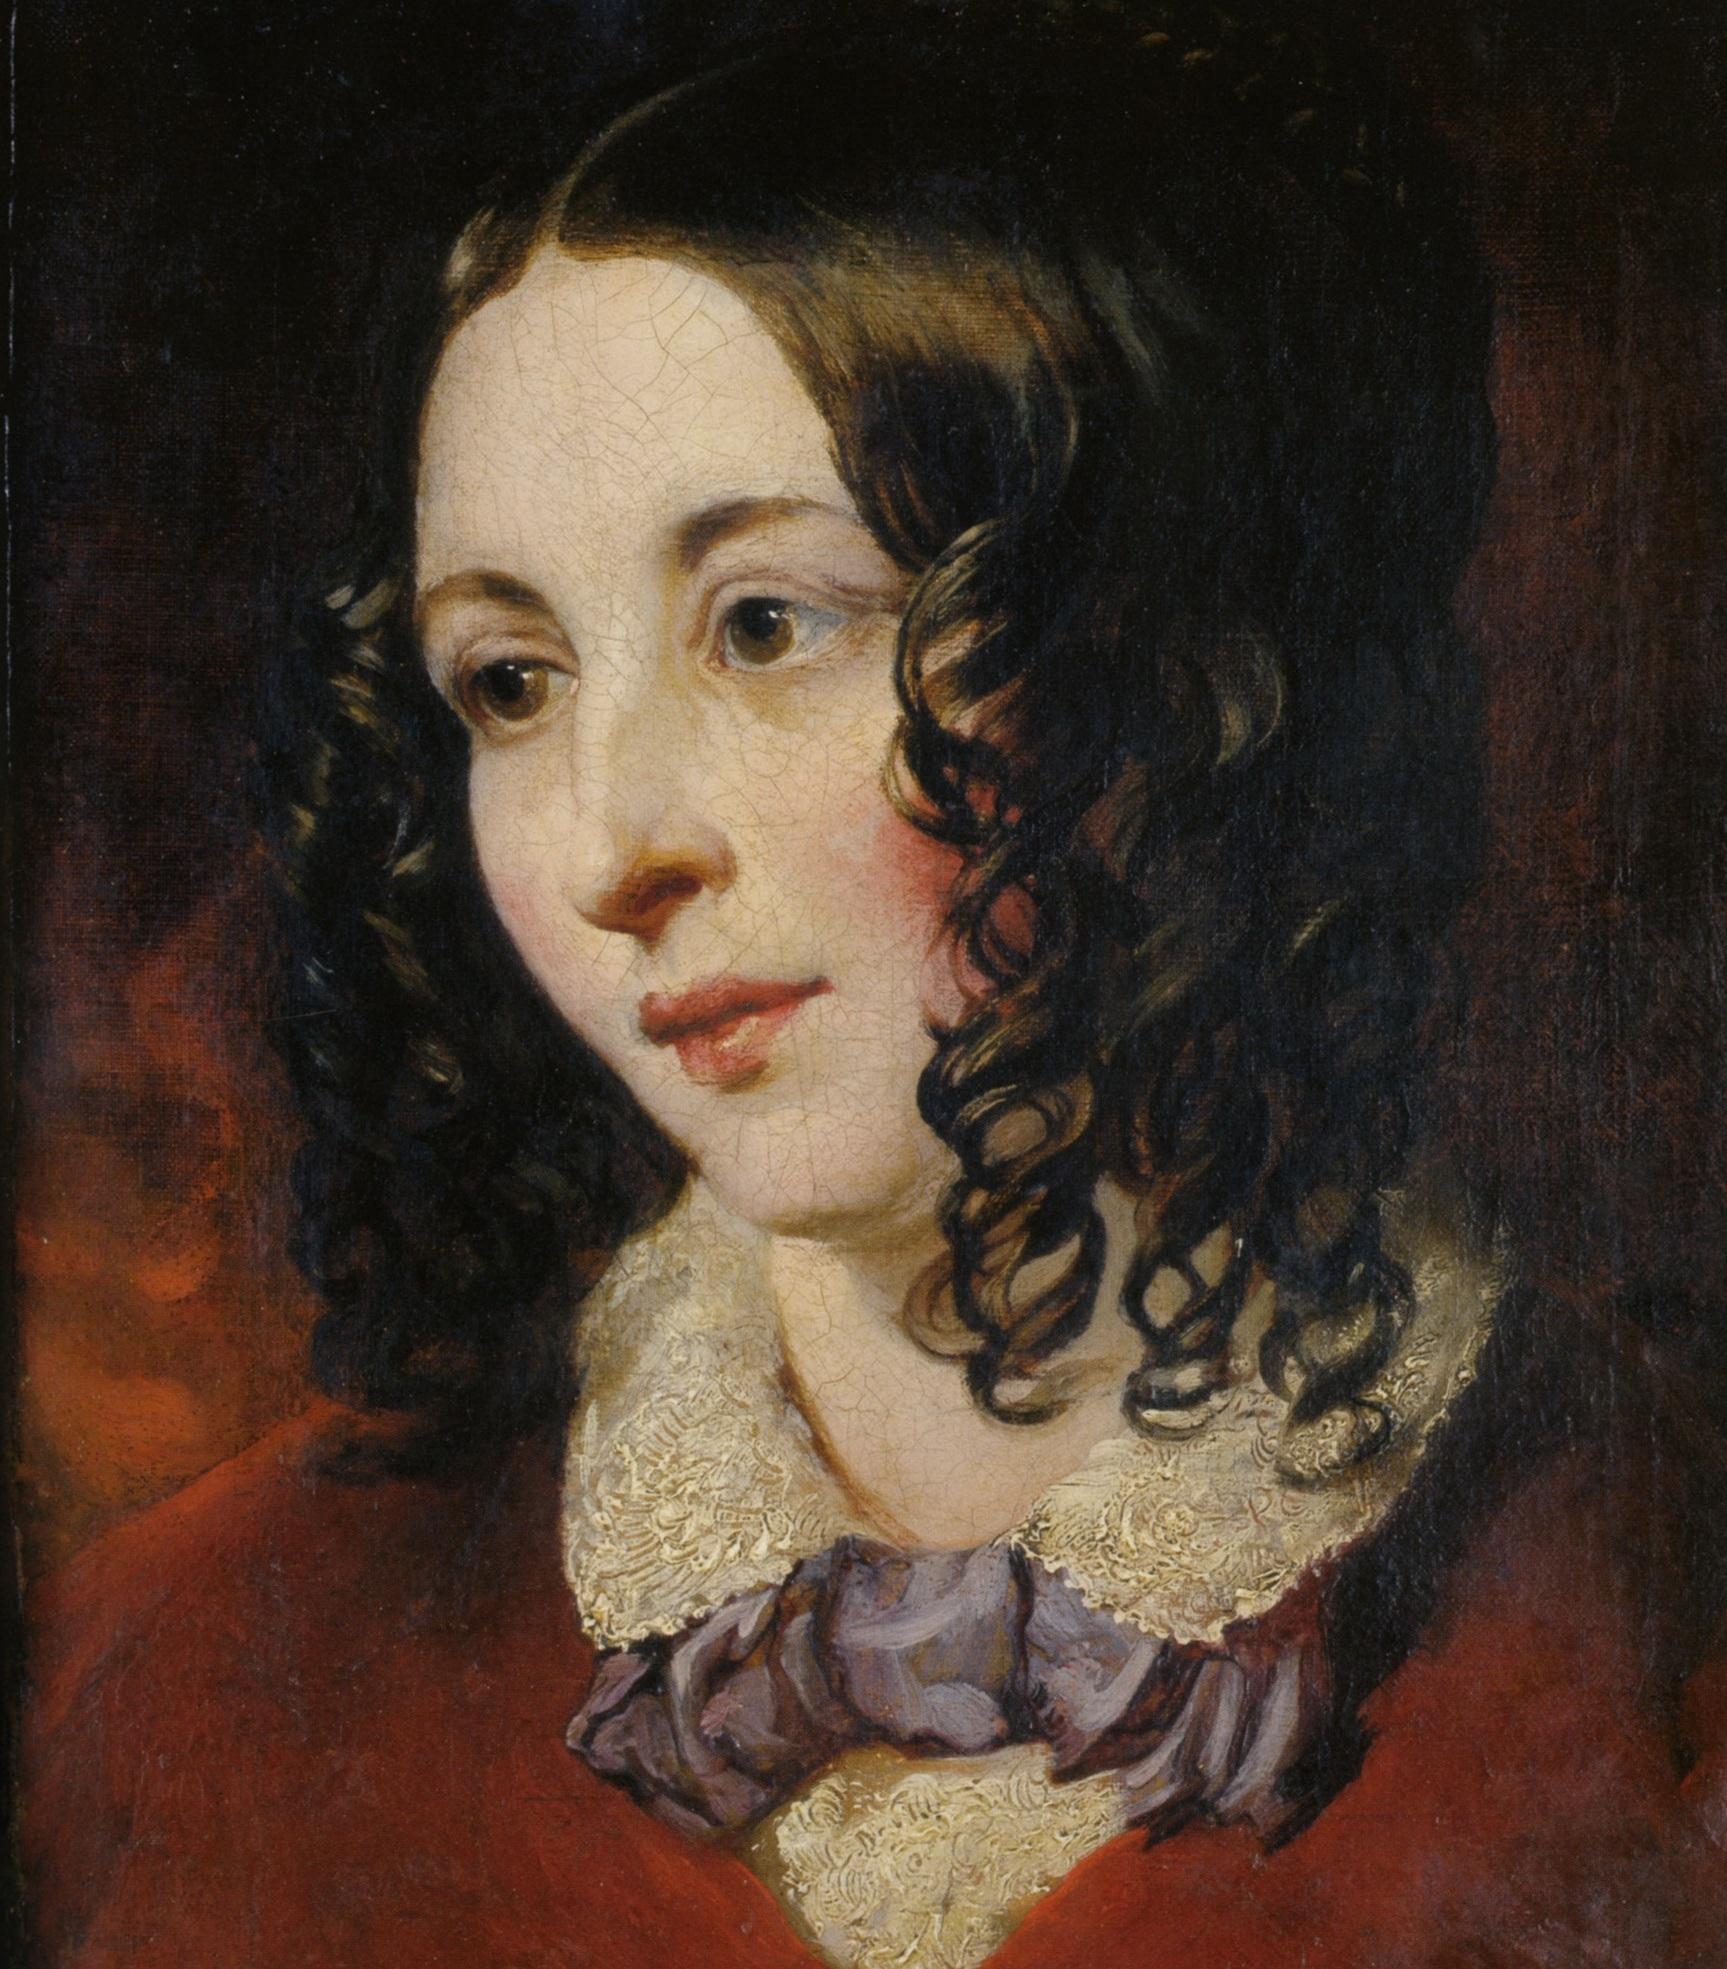 Portrait by [[William Etty]], c. 1845